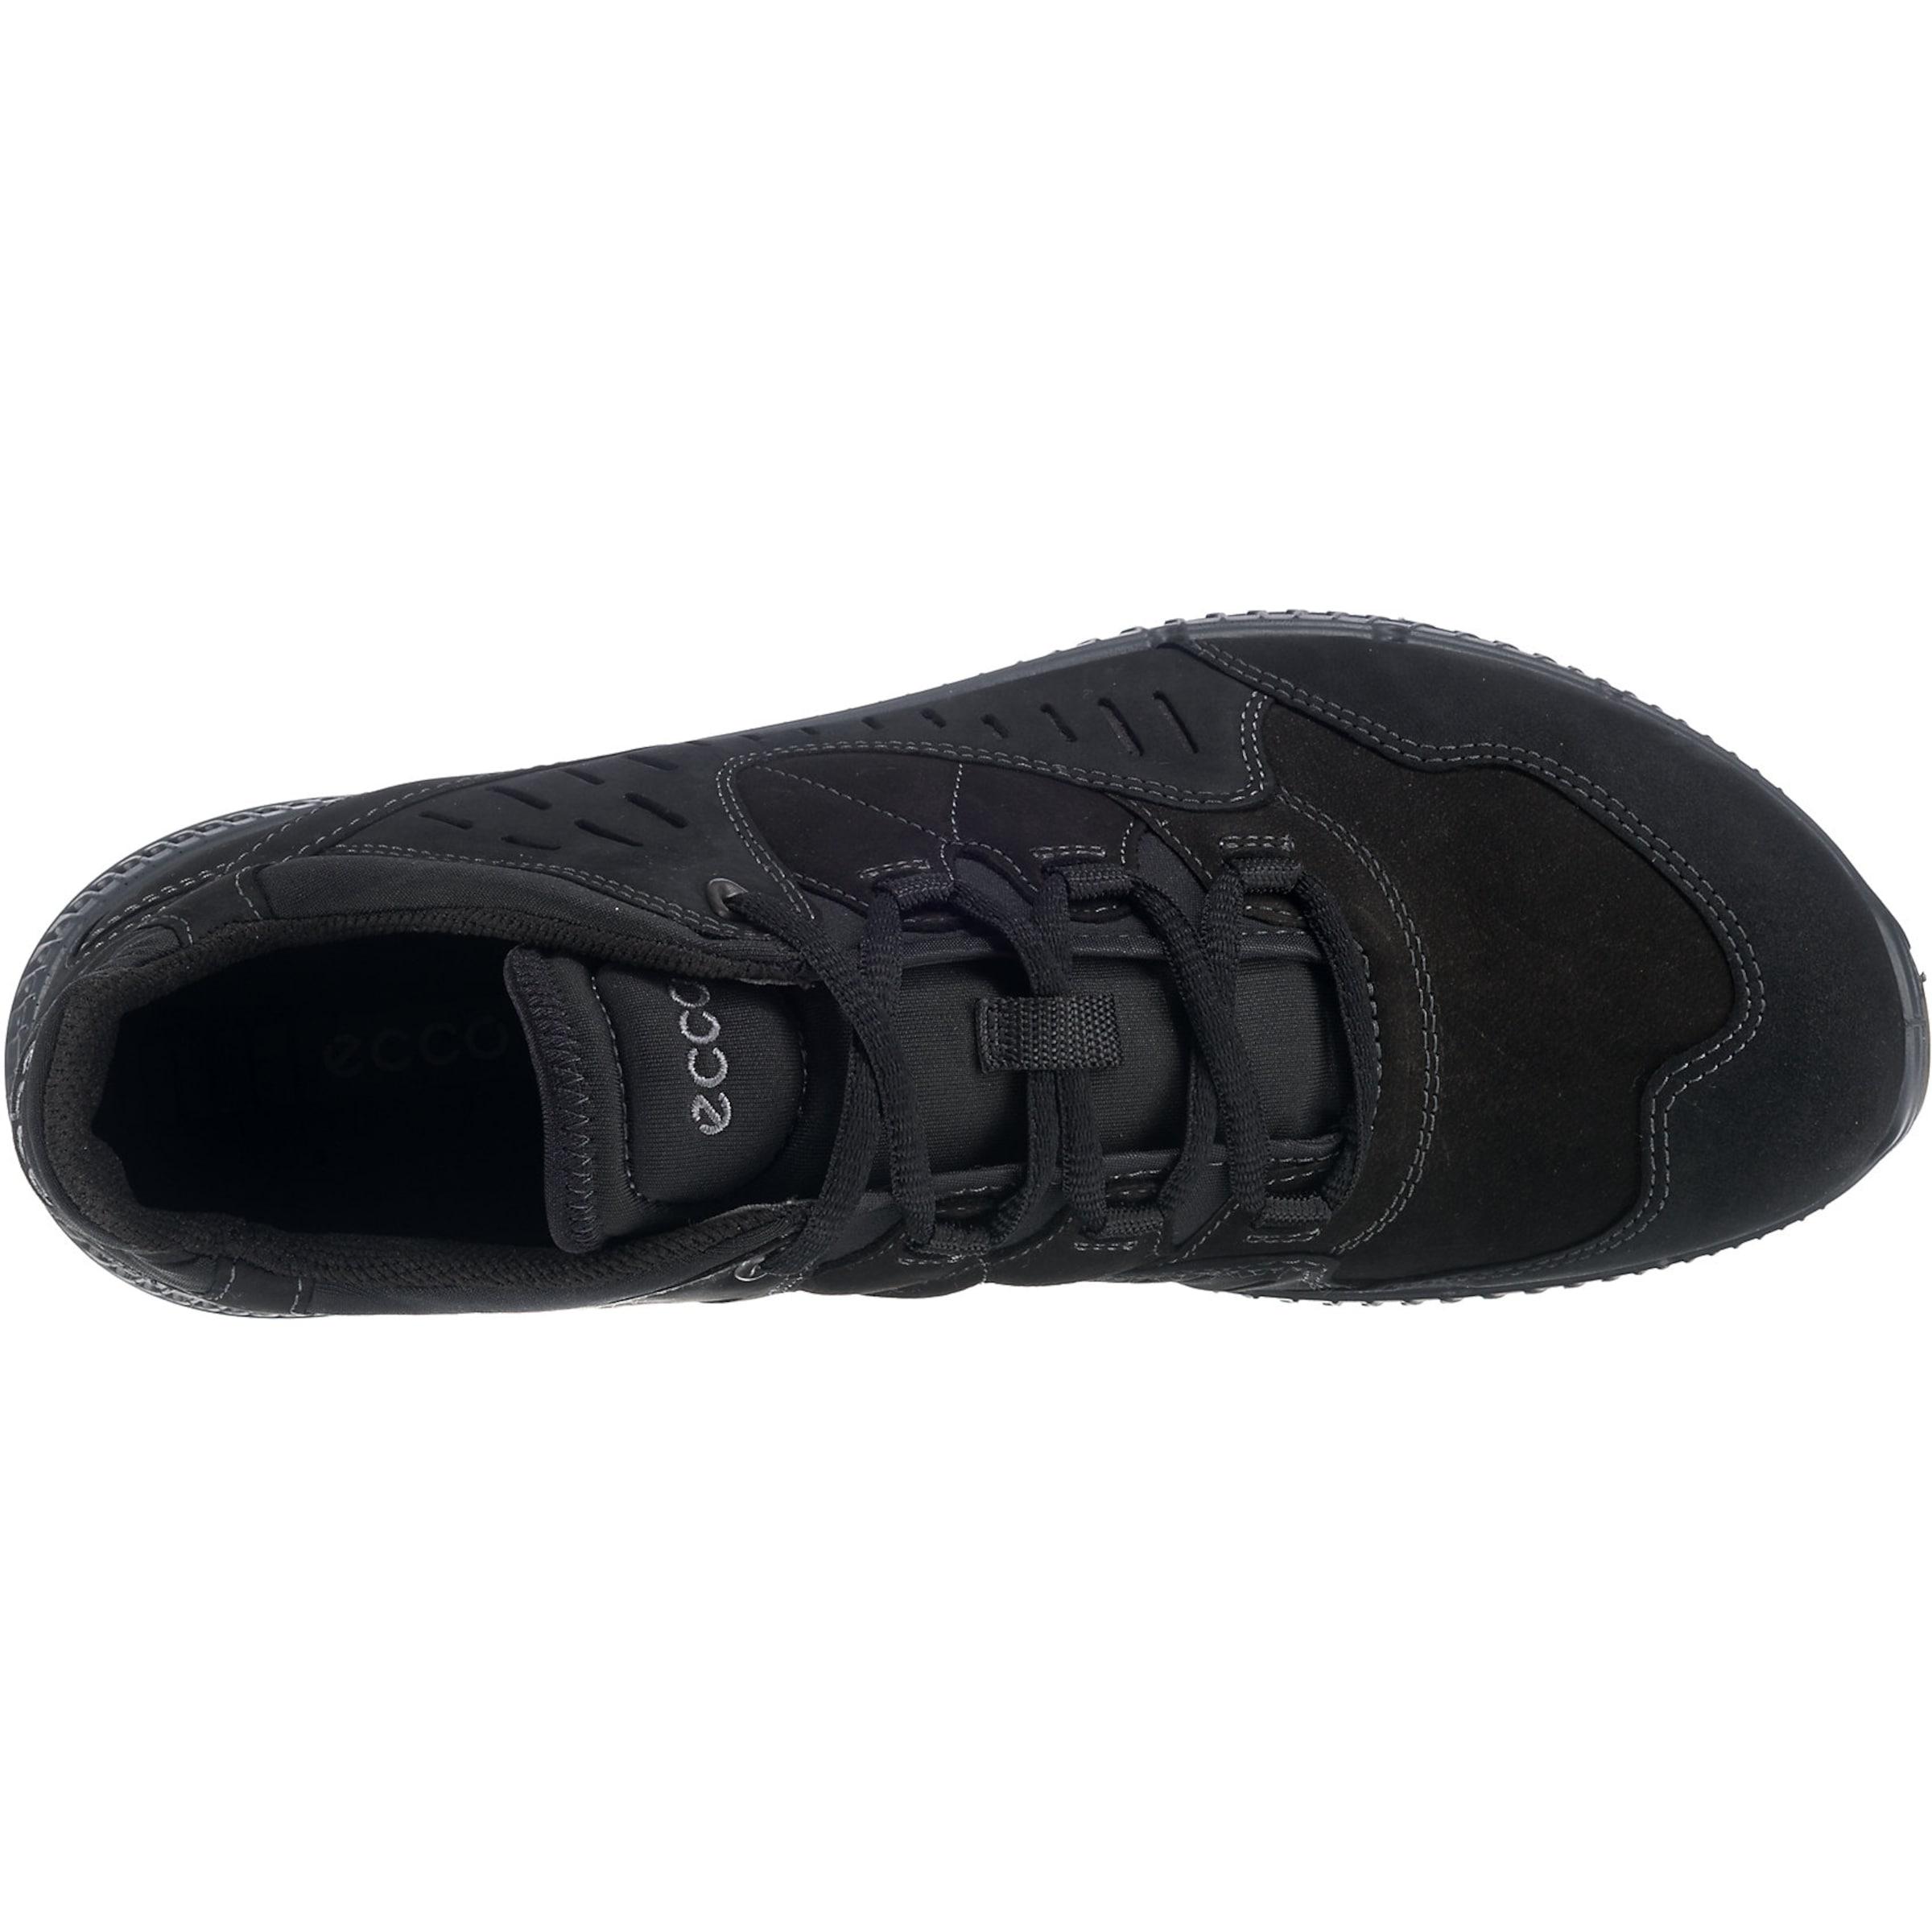 In Ecco Schwarz Sneaker Ecco Sneaker 'terrawalk' wPnX0k8O